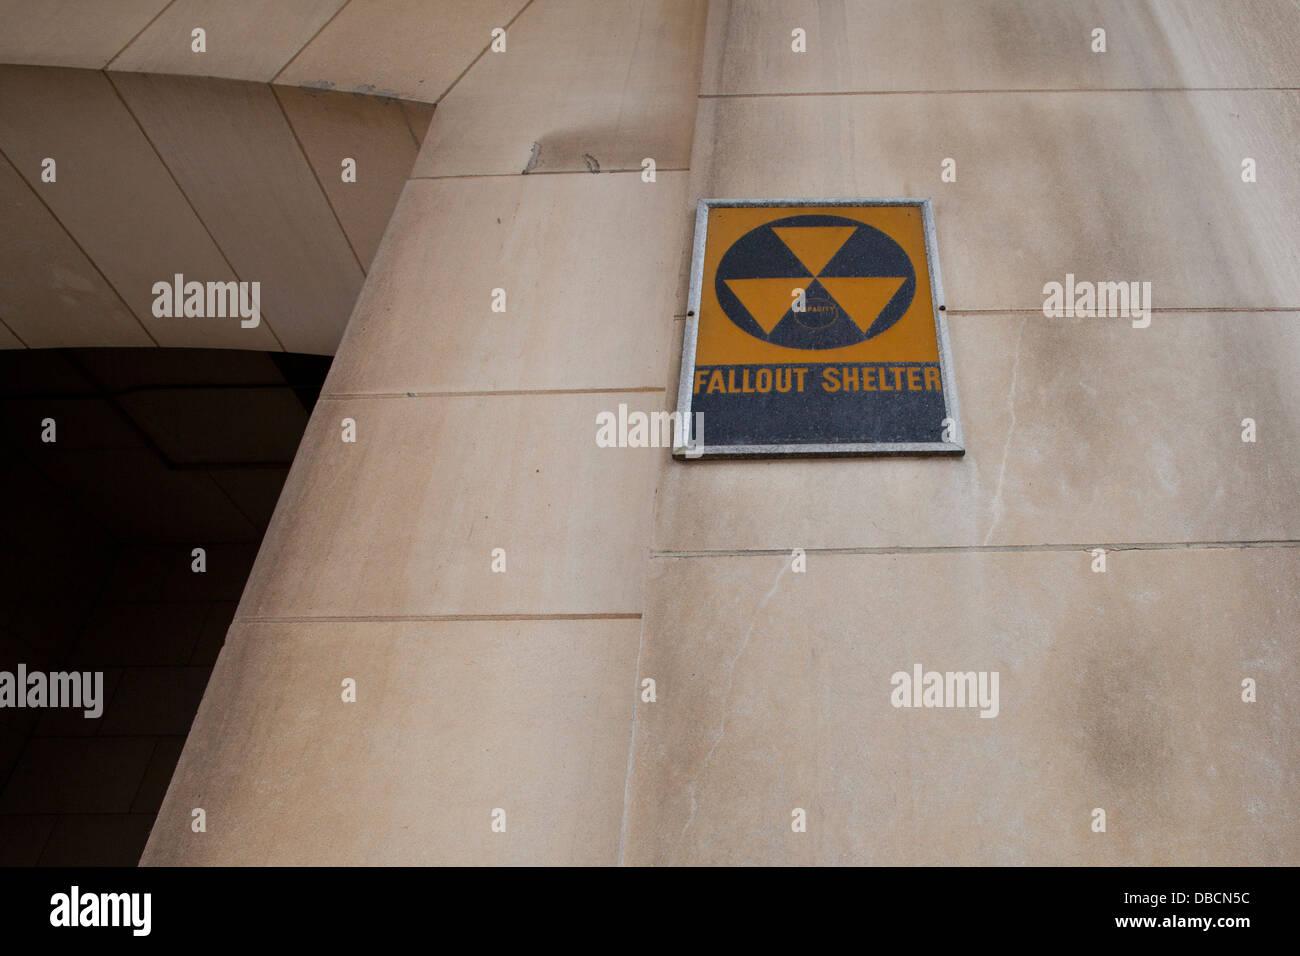 Fallout shelter sign on building entrance - Washington DC USA Stock Photo